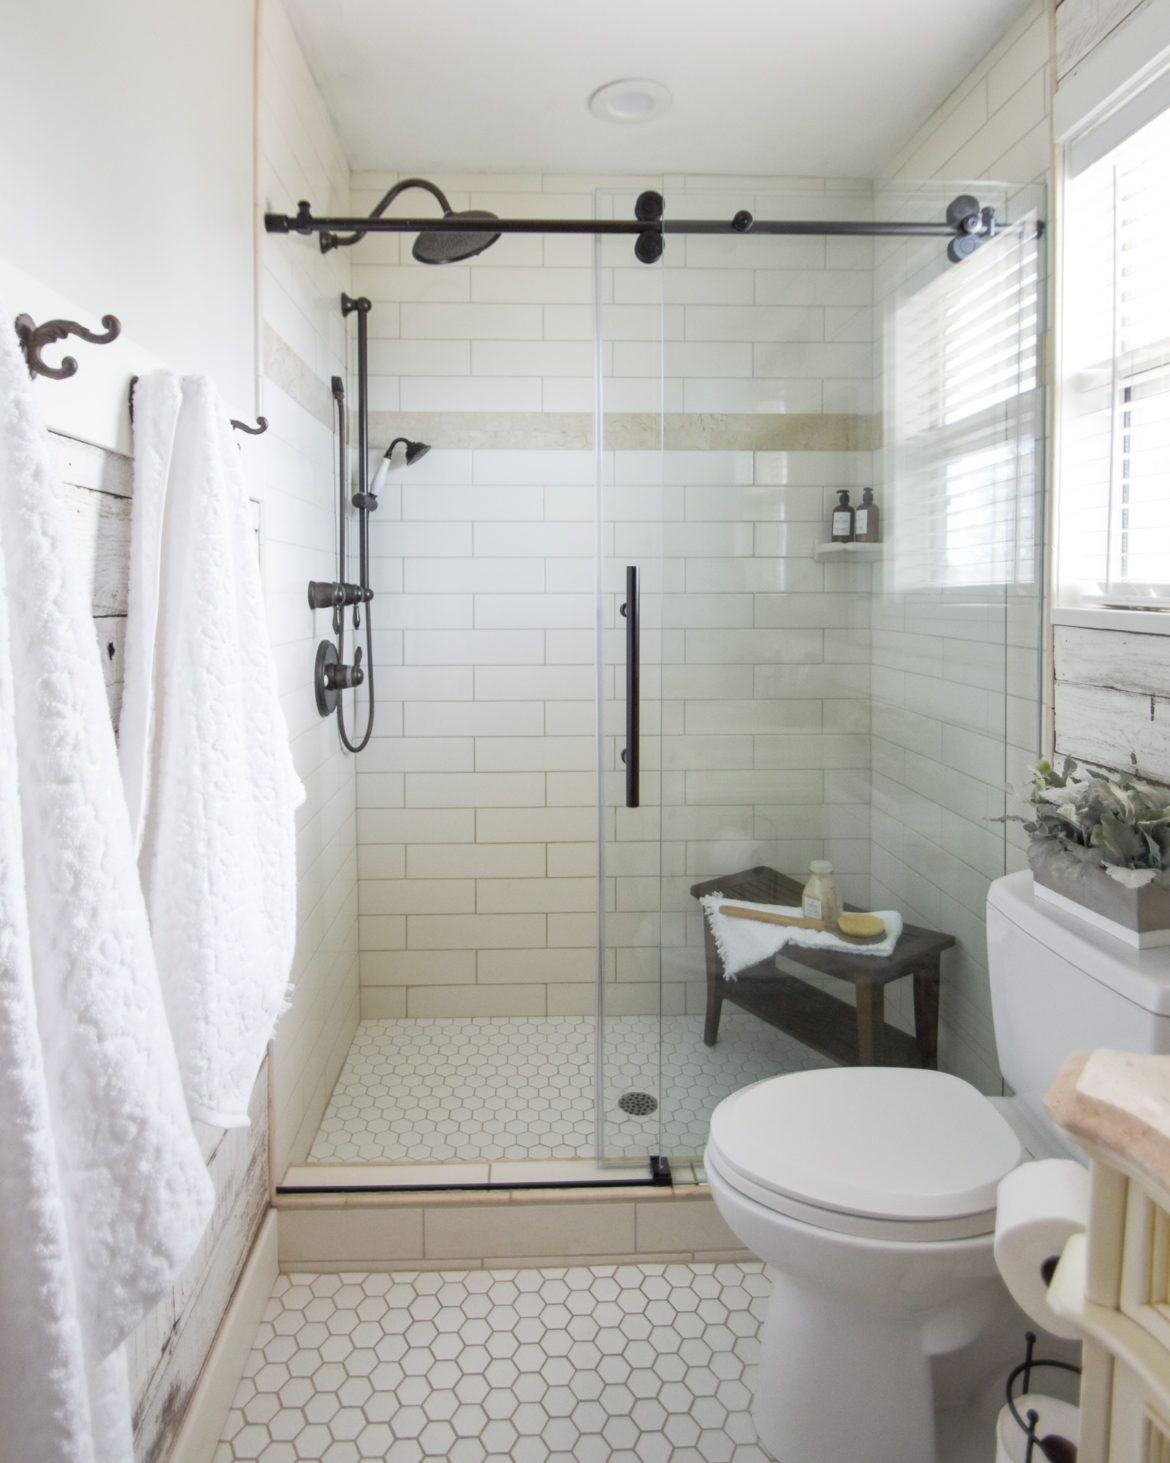 Marvelous Master Bathroom Ideas For Home28